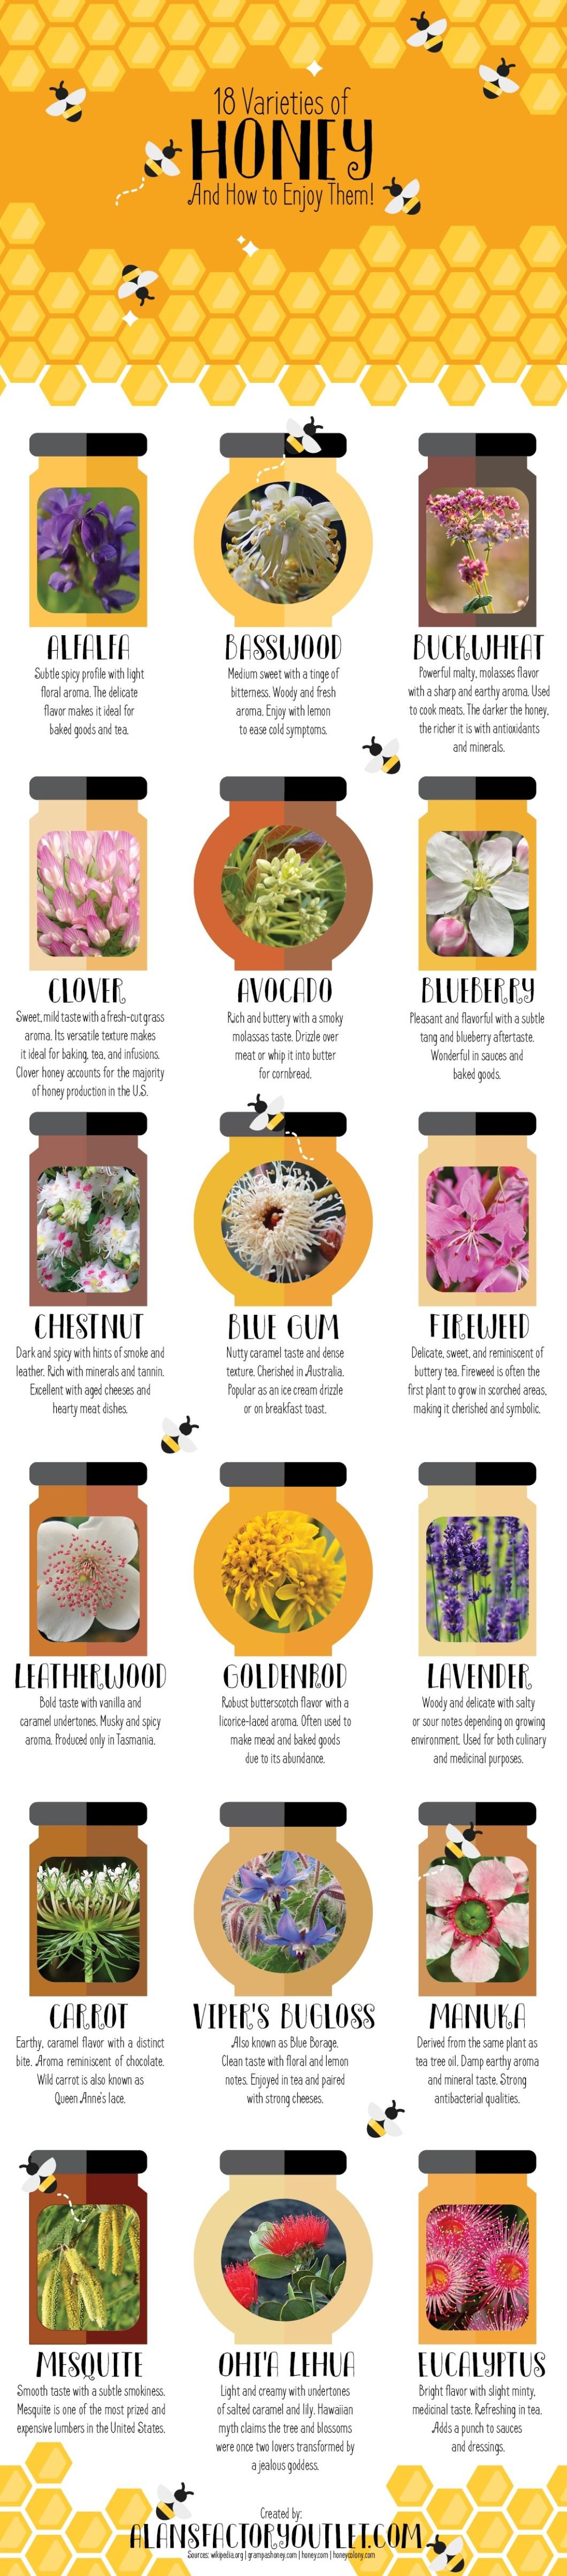 18 Honey Varieties from Around the World - Infographic